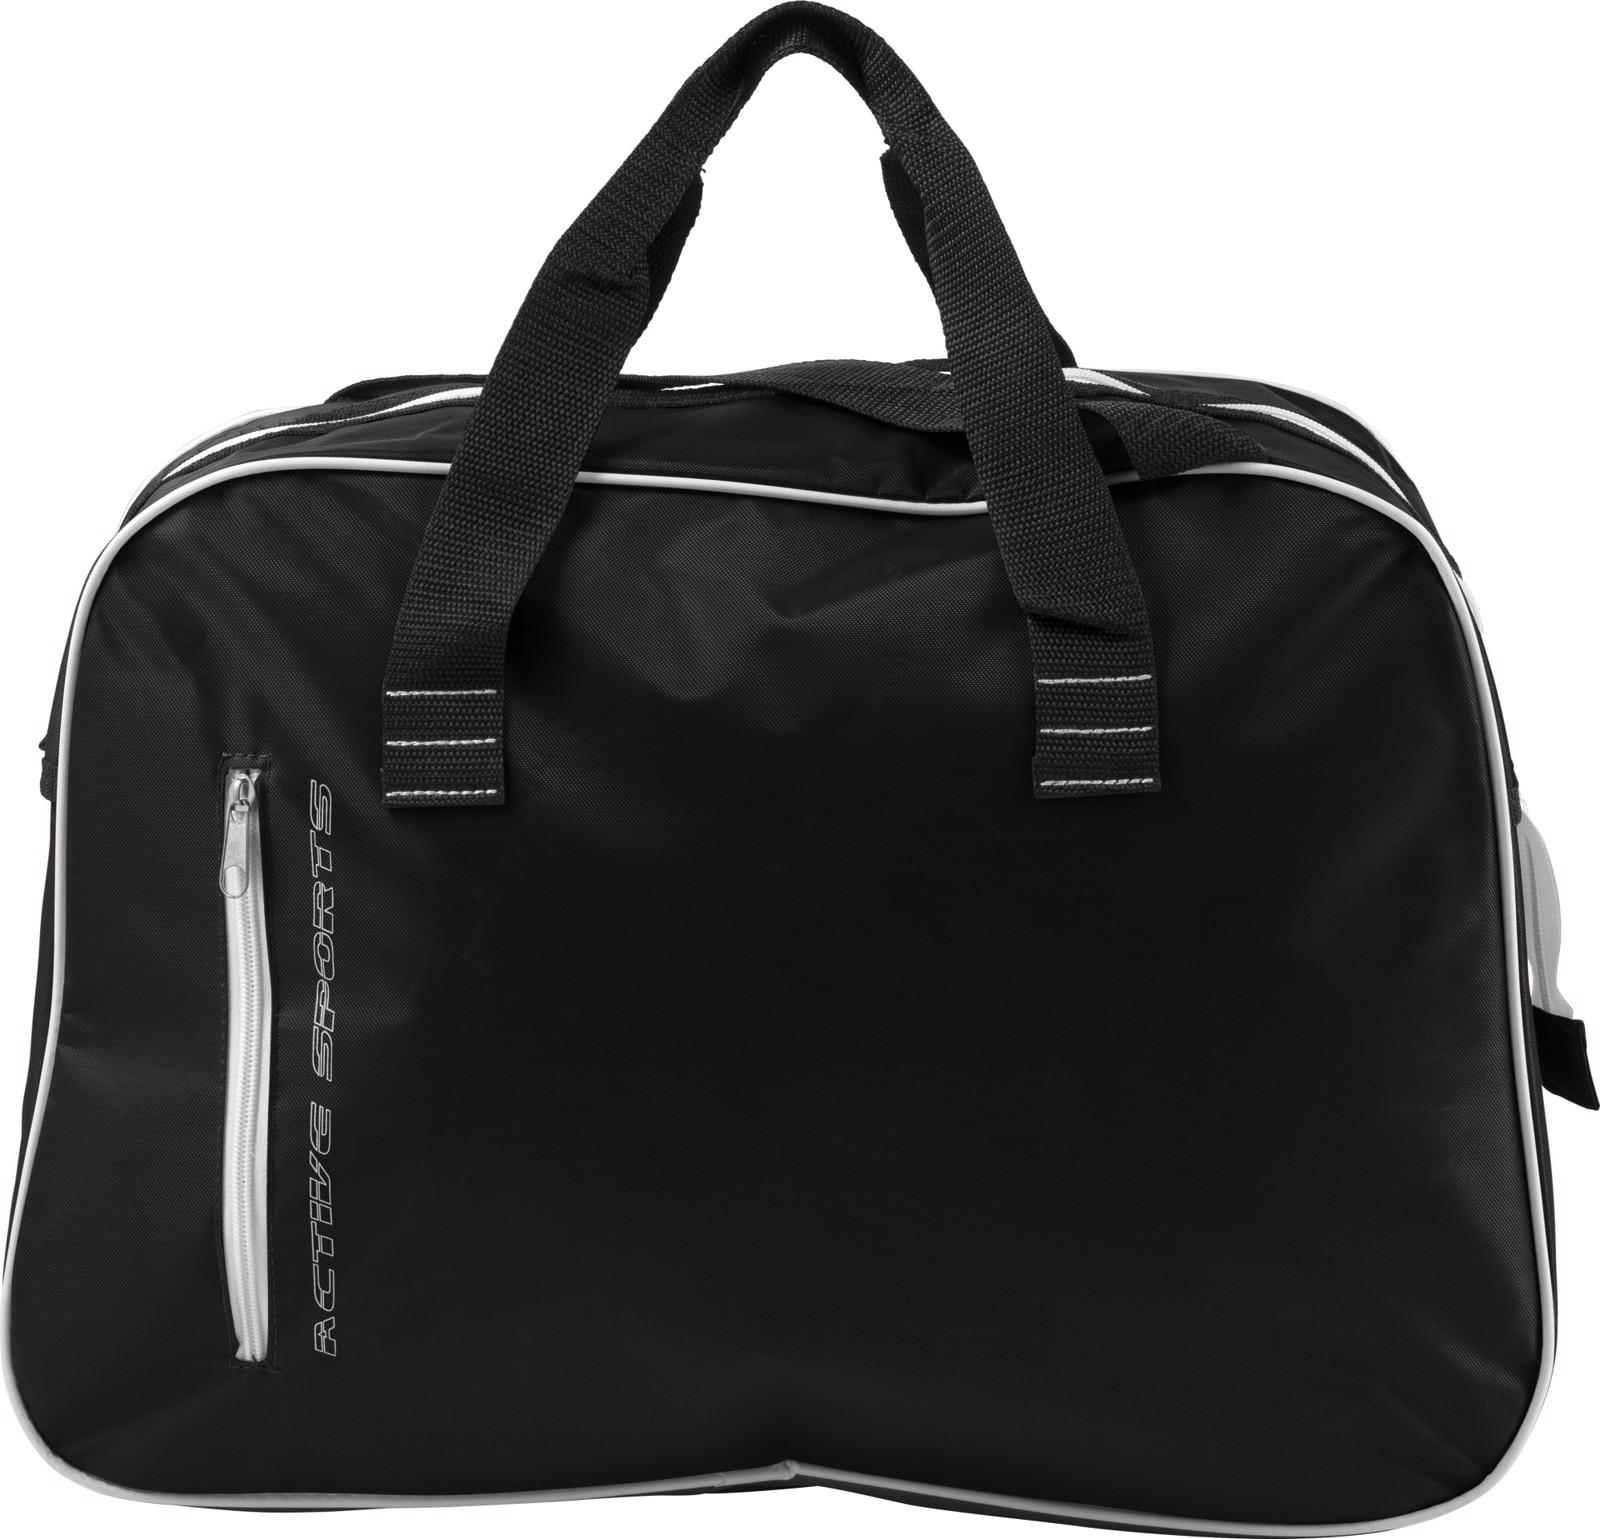 Polyester sports bag - Black